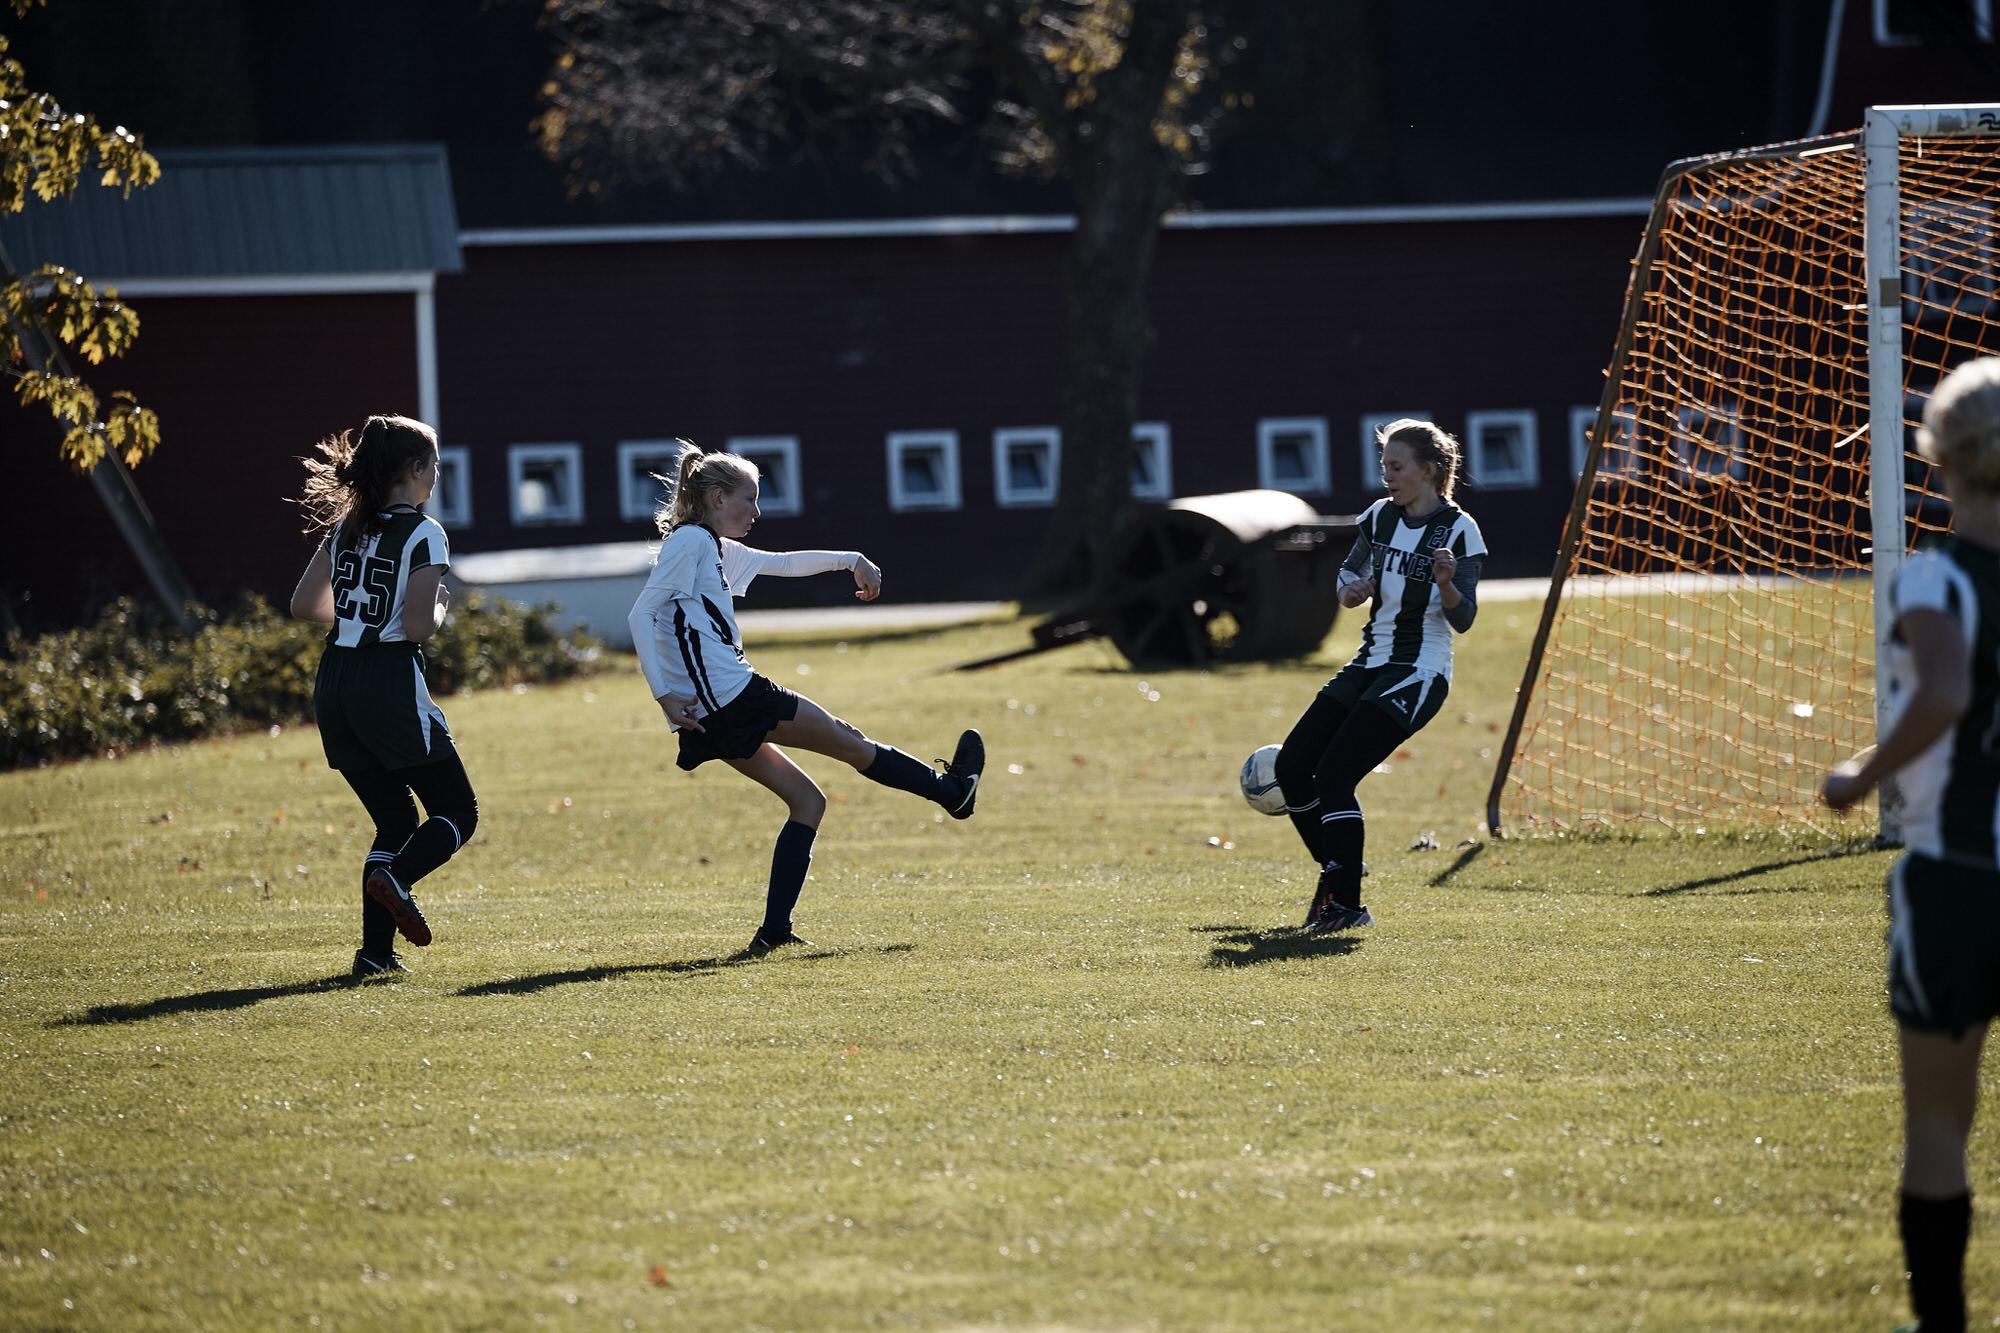 Girls Varsity Soccer vs. Putney School - October 26, 2018 - 005.jpg